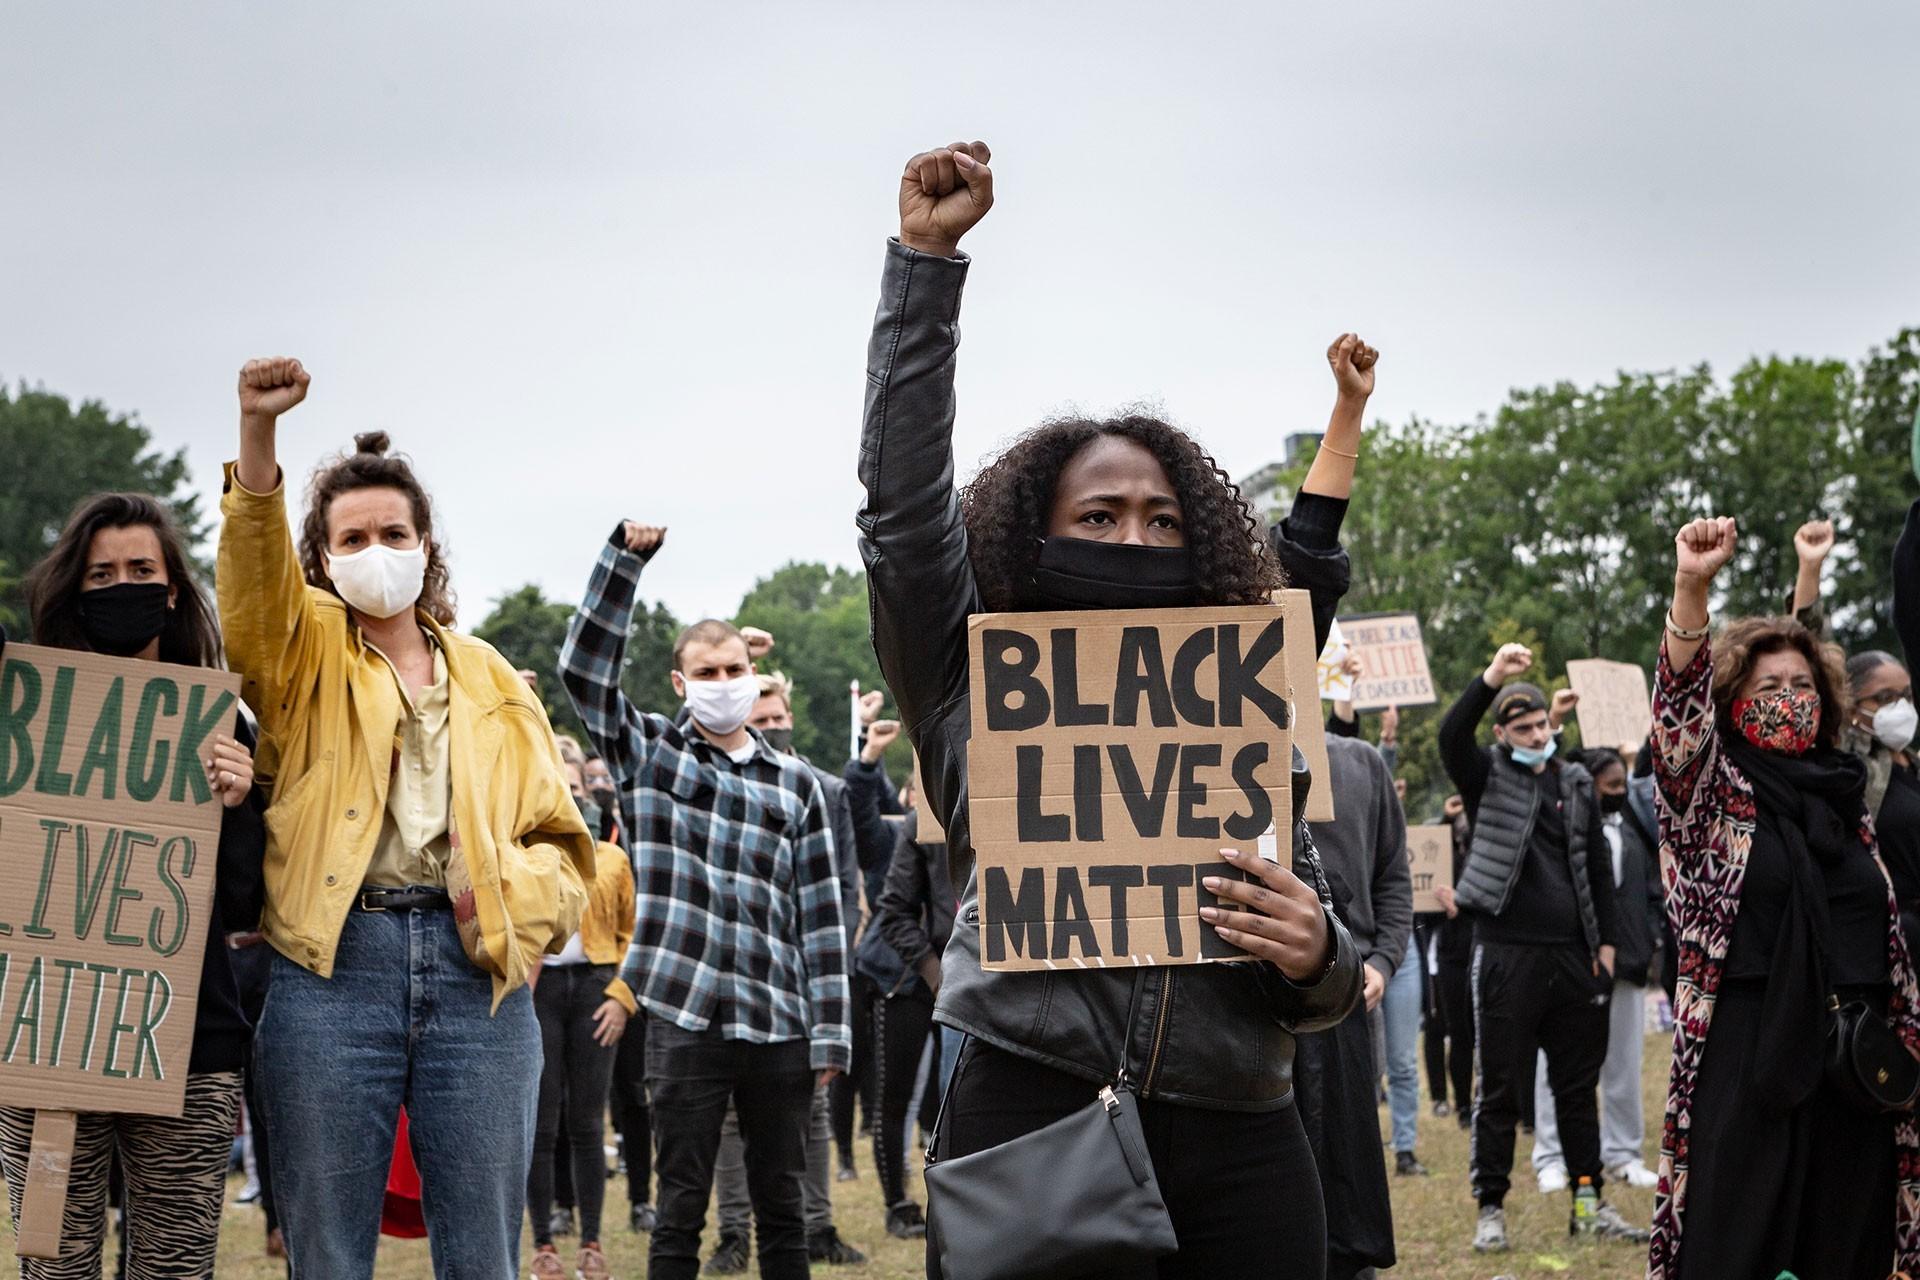 Siyahların yaşamı önemlidir yazılı döviz taşıyan genç kadın, sağ yumrupu havada